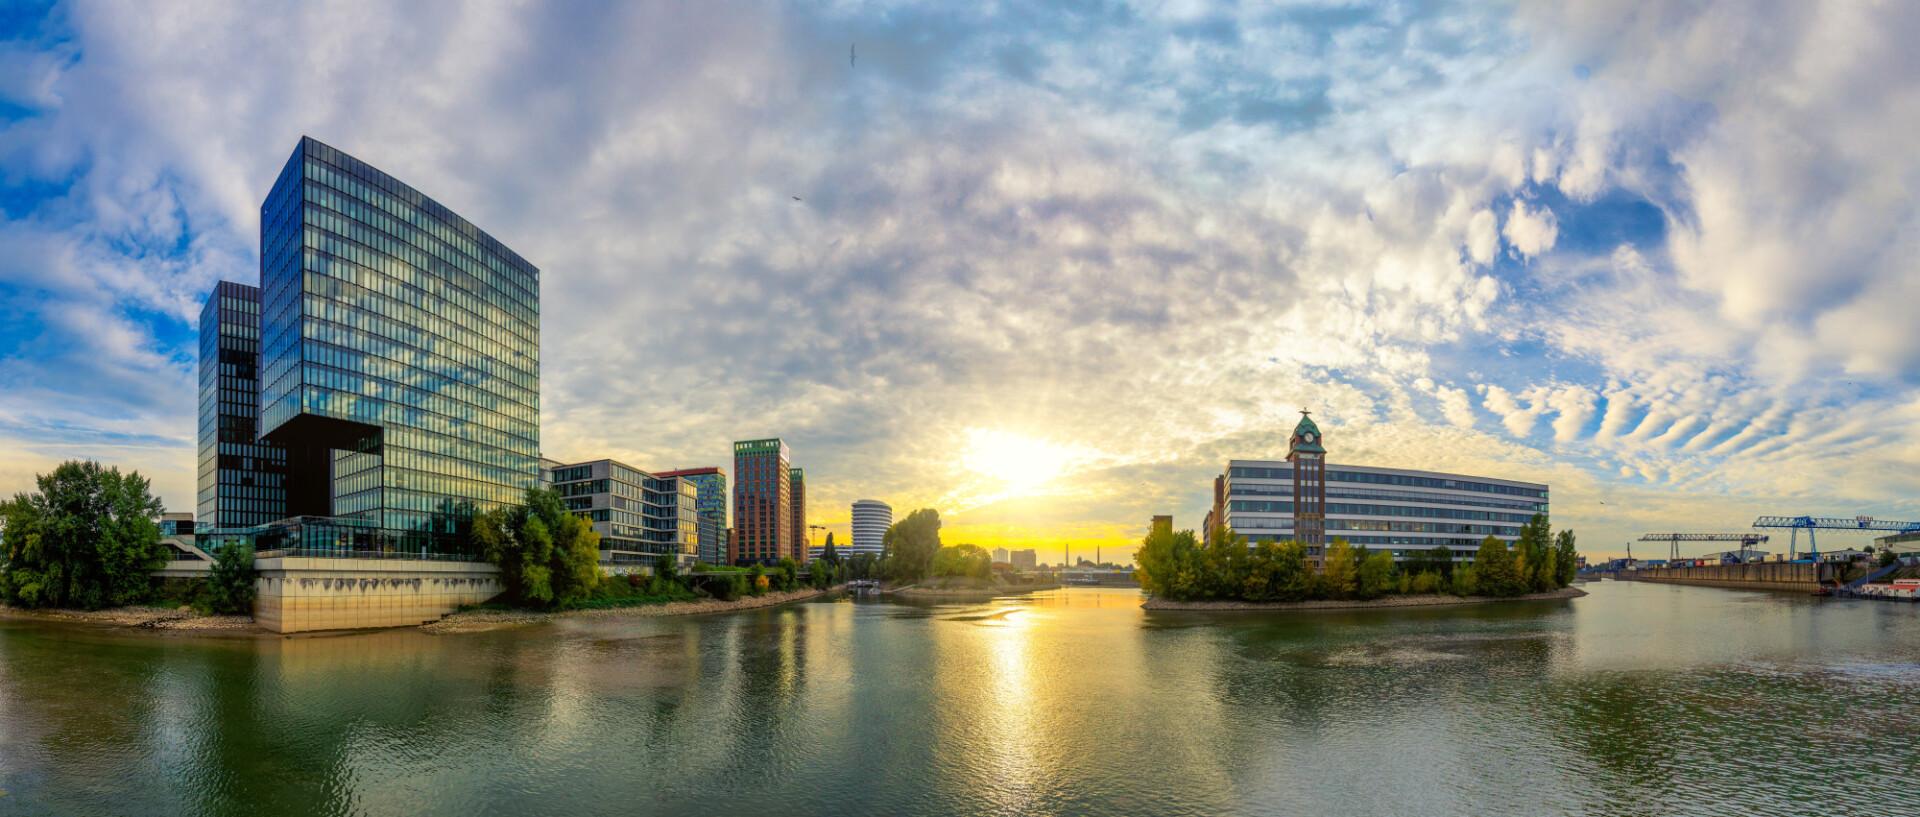 Dusseldorf city panorama on the rhine